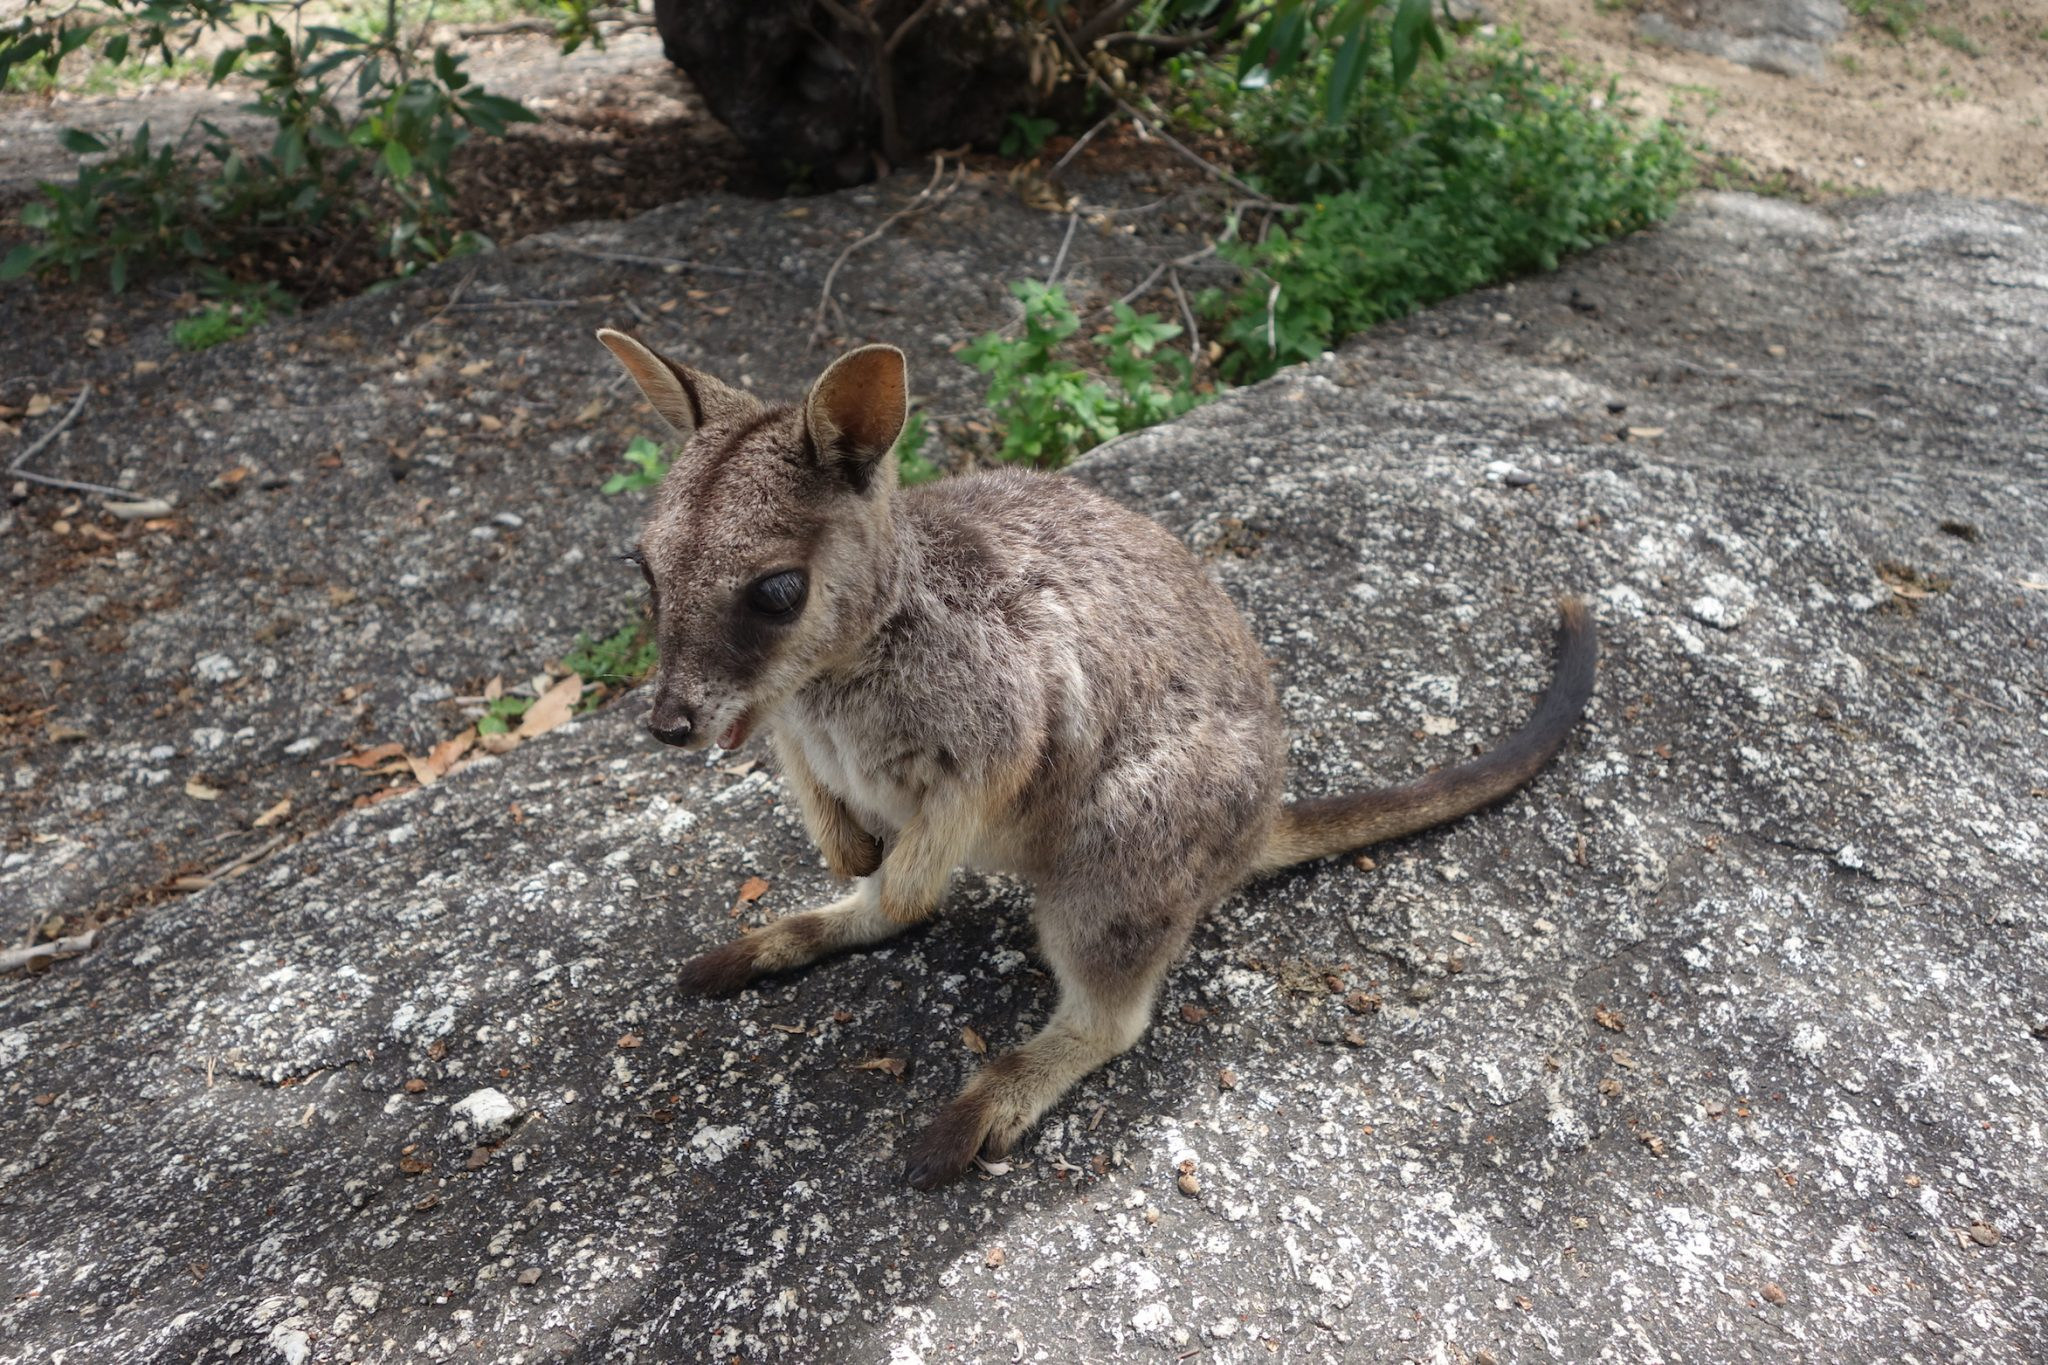 Australien_AthertonTablelands_15_GraniteGorgeNaturePark_Wallabies